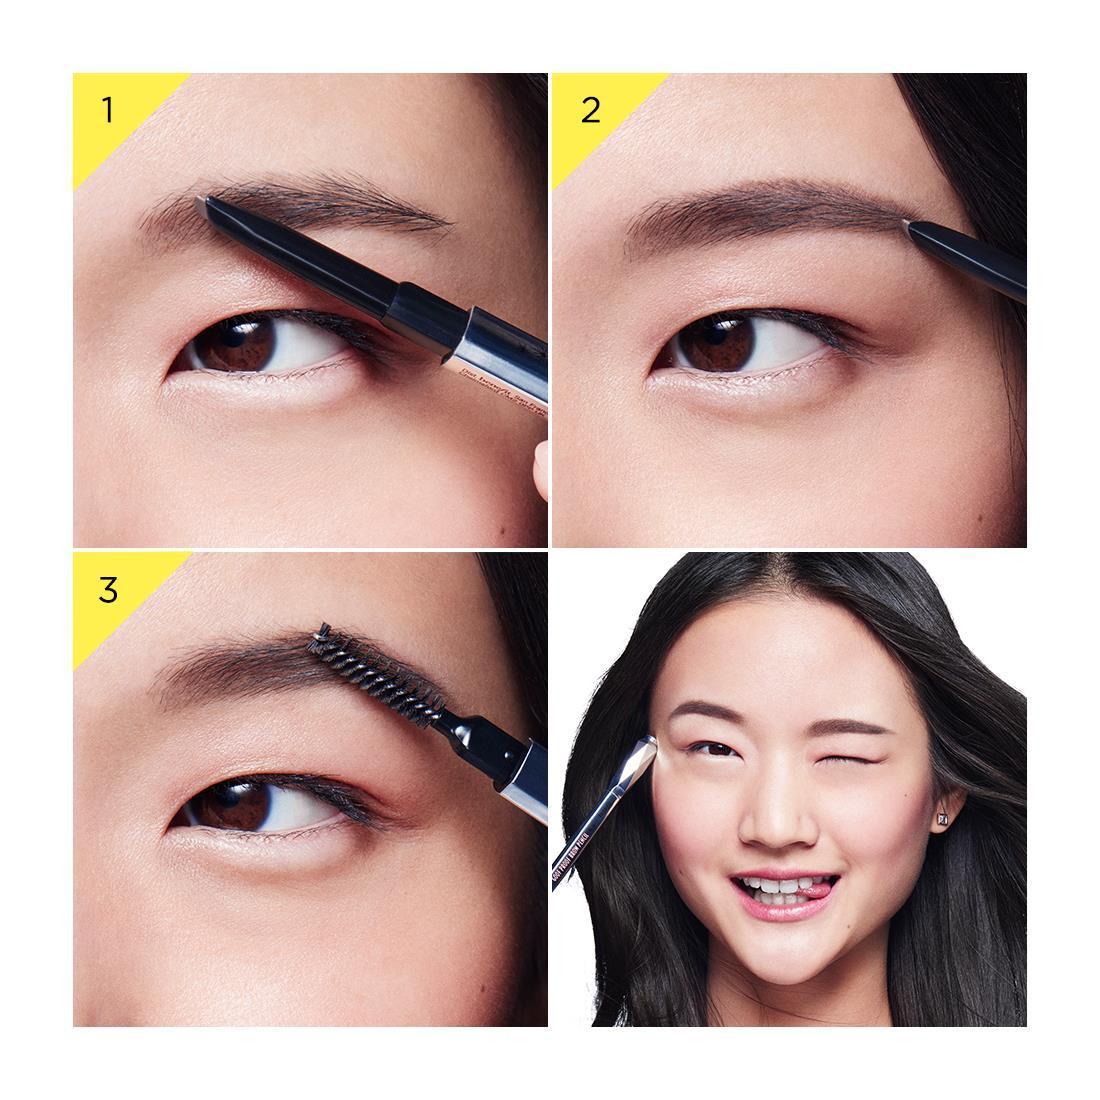 Benefit Goof Proof Eyebrow Pencil Shade 04 Medium Lazada Singapore